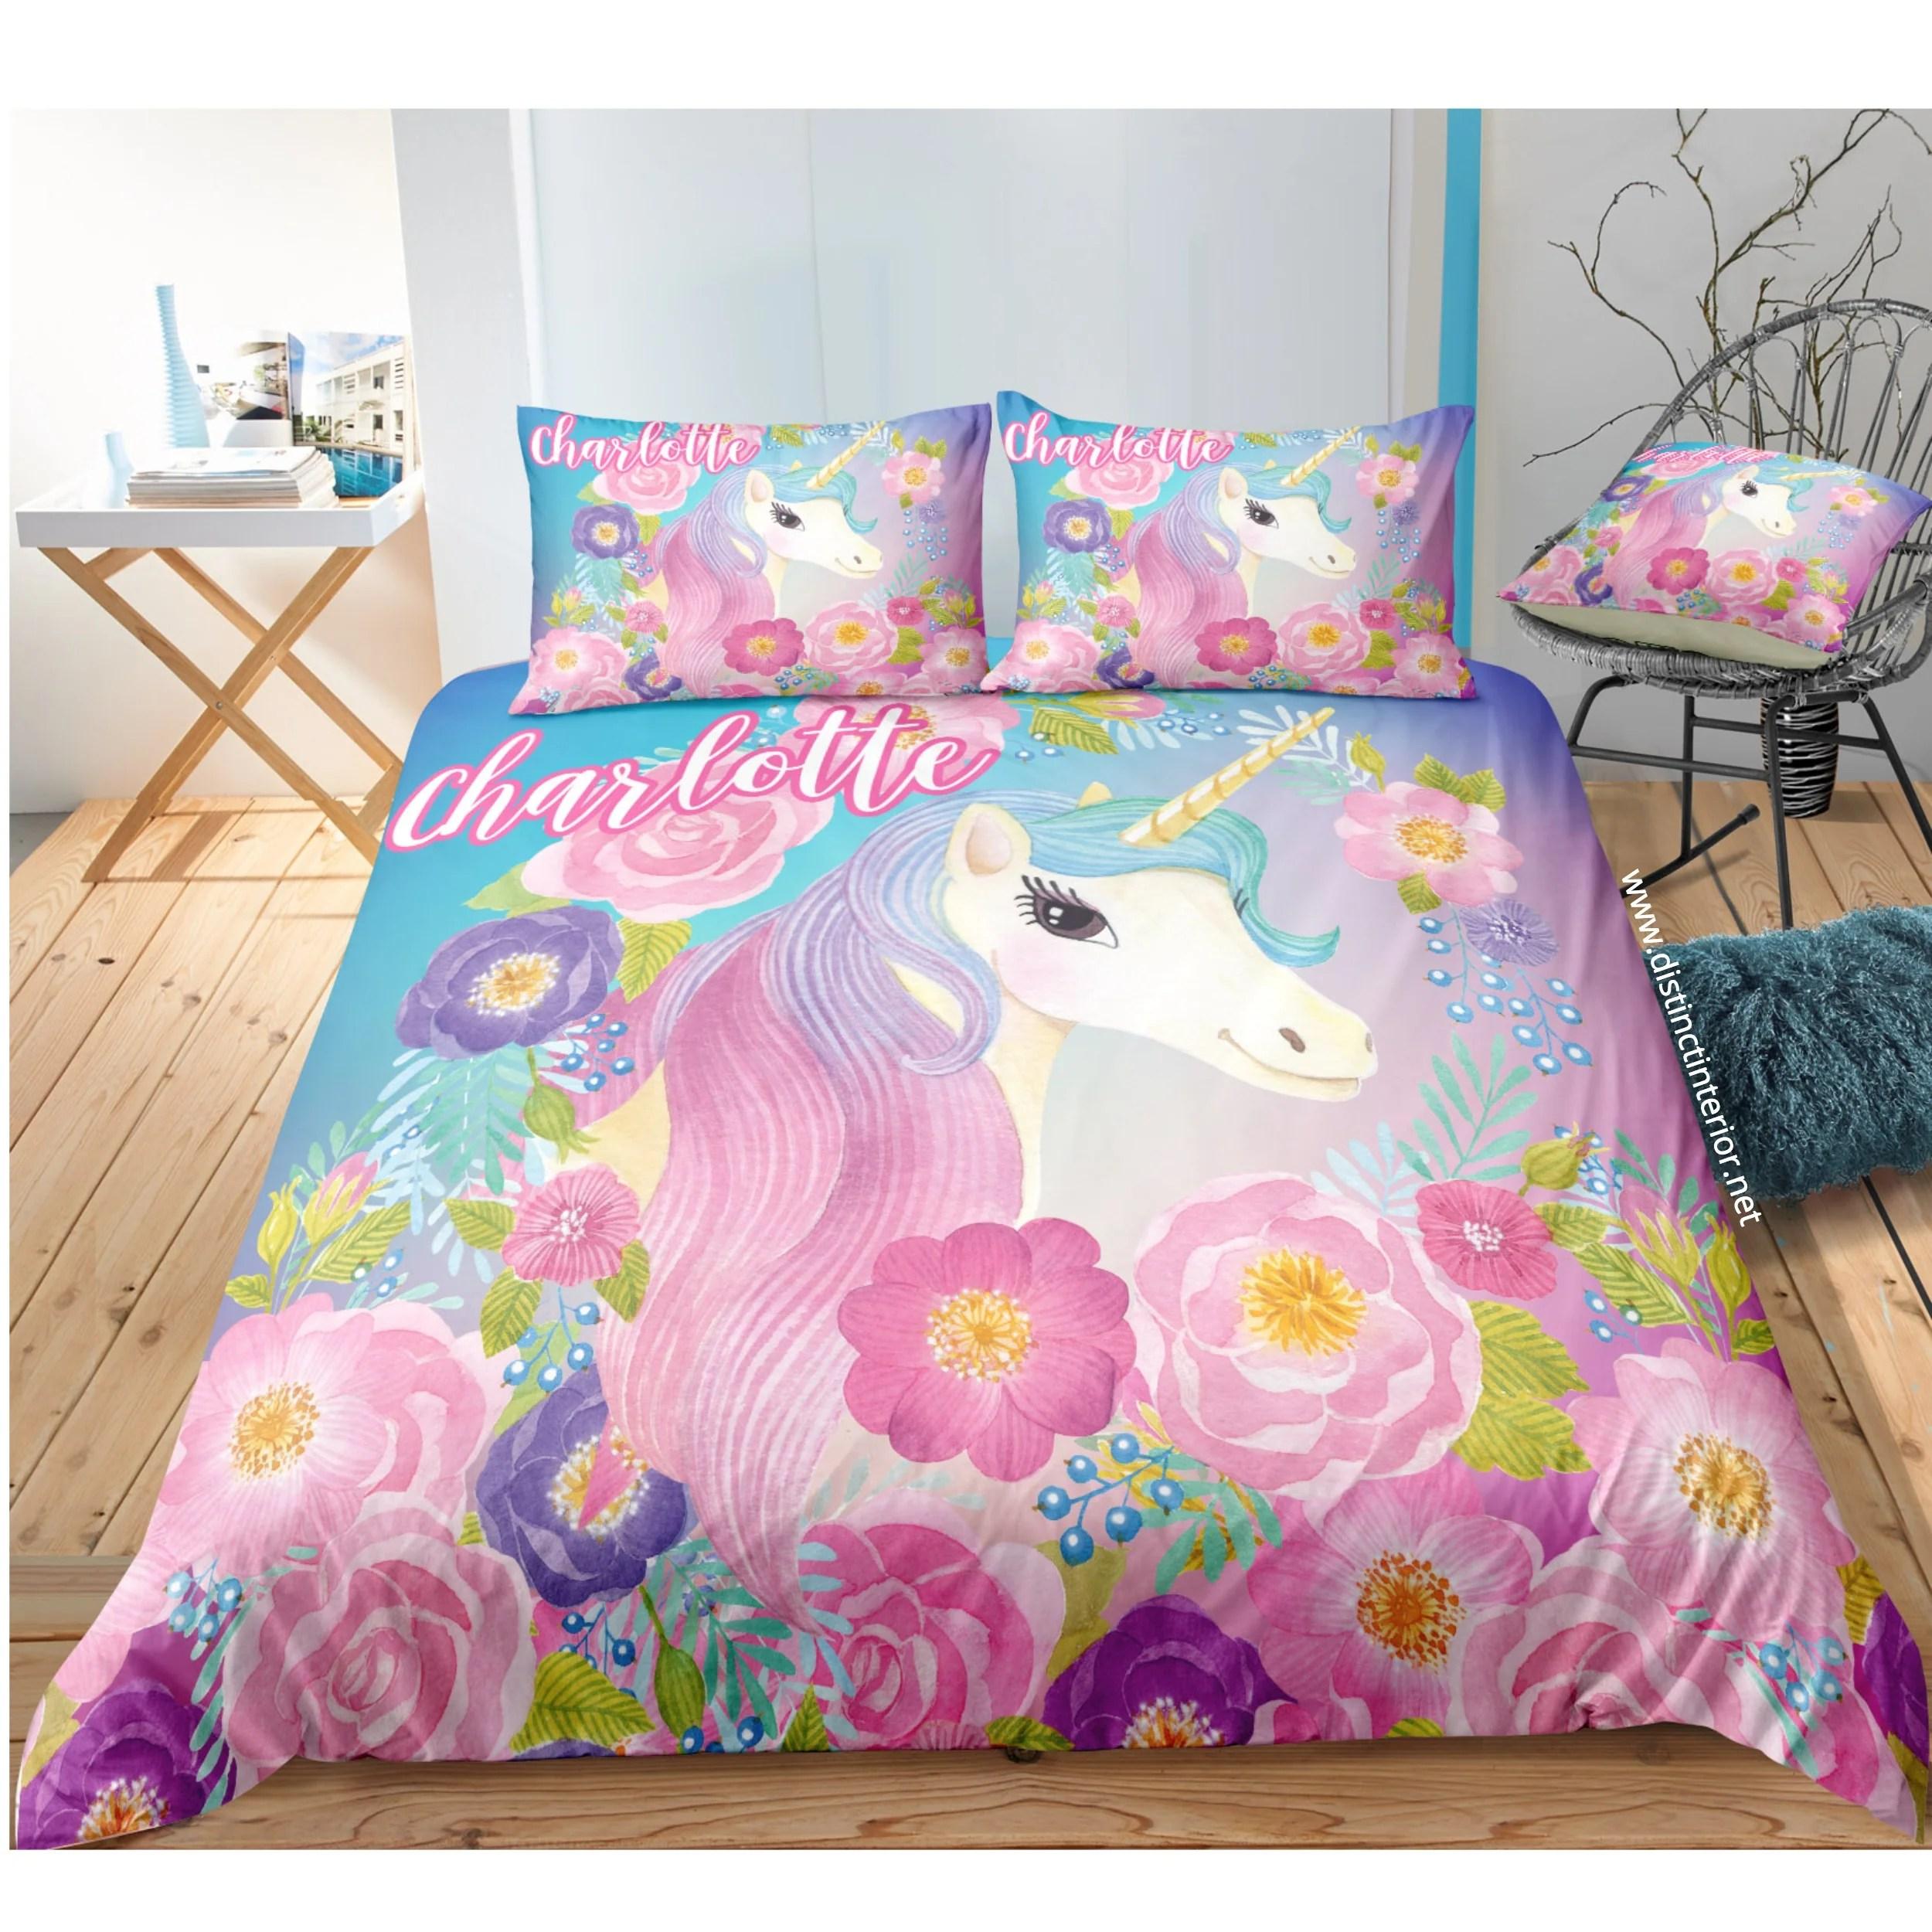 distinct interior personalized pink purple poppy rose unicorn bedding set with name